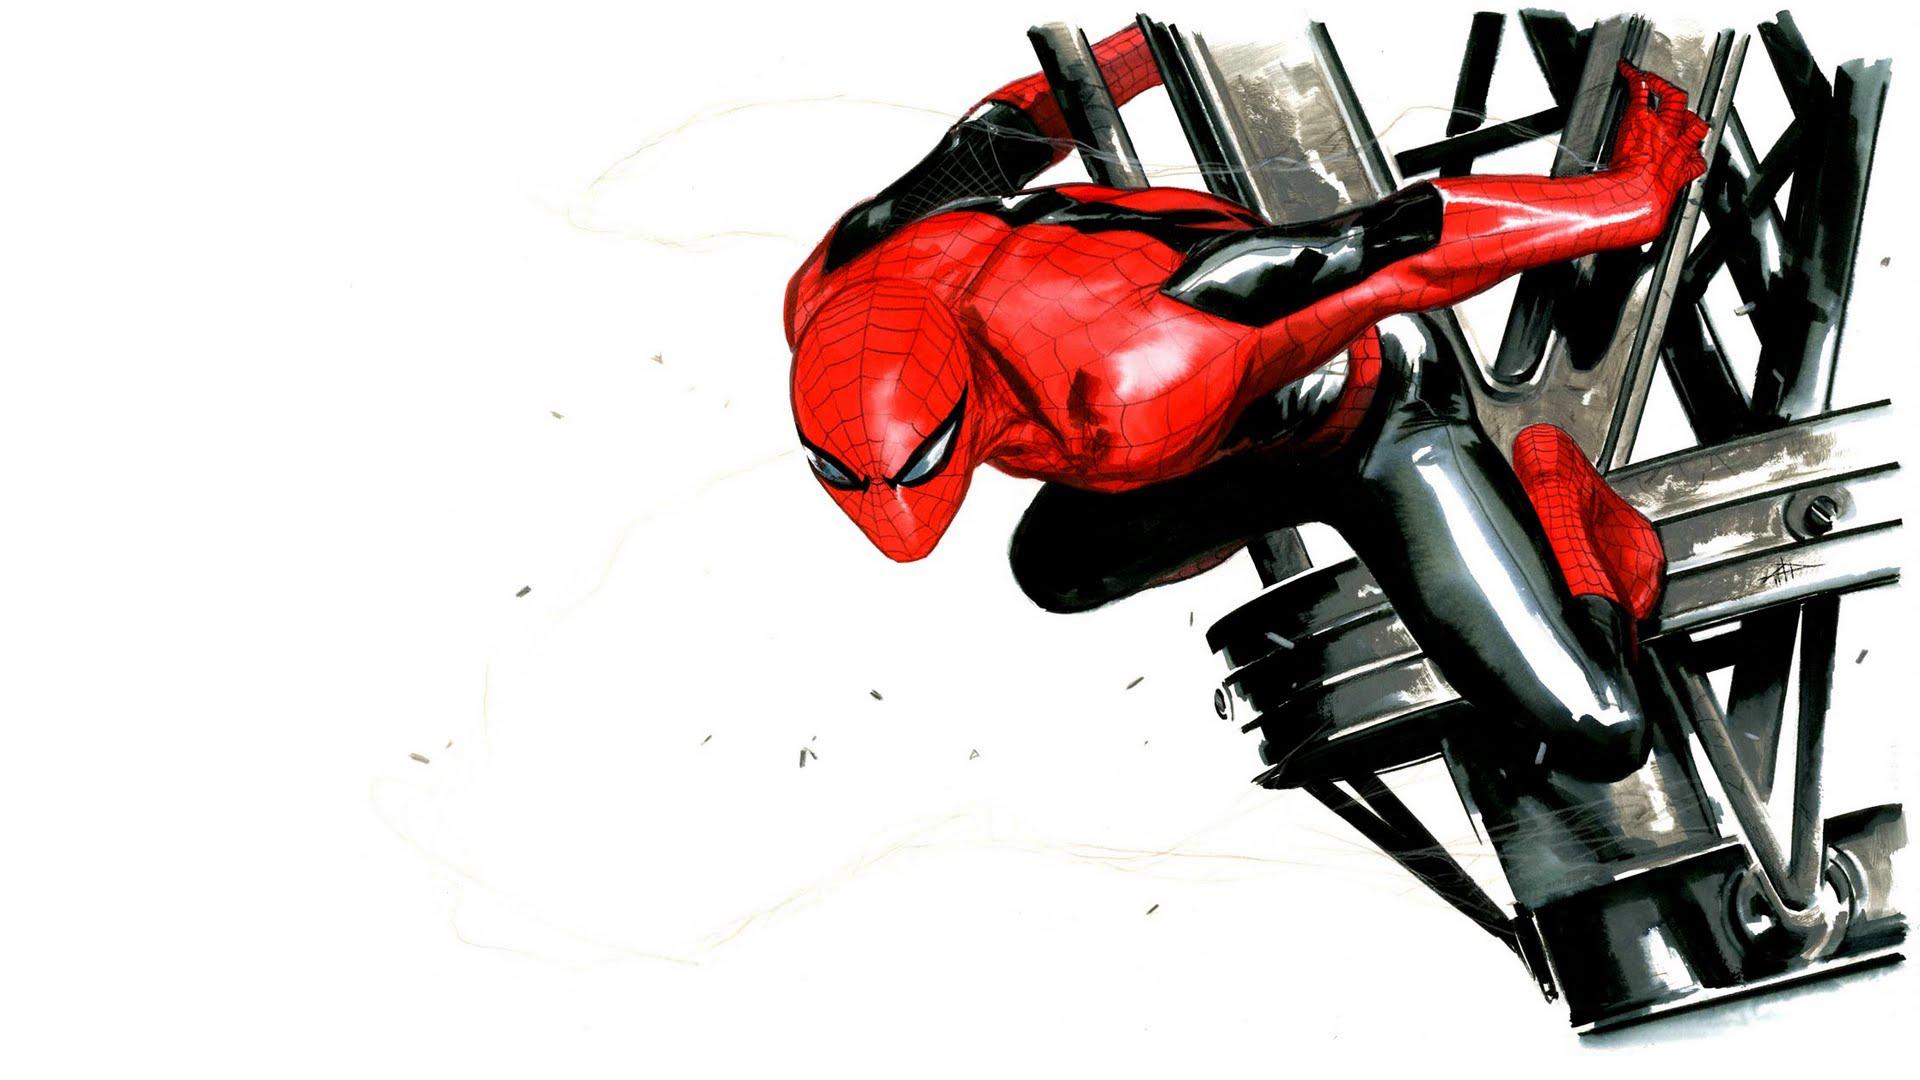 Spiderman comics spider man superhero wallpaper 1920x1080 39496 1920x1080